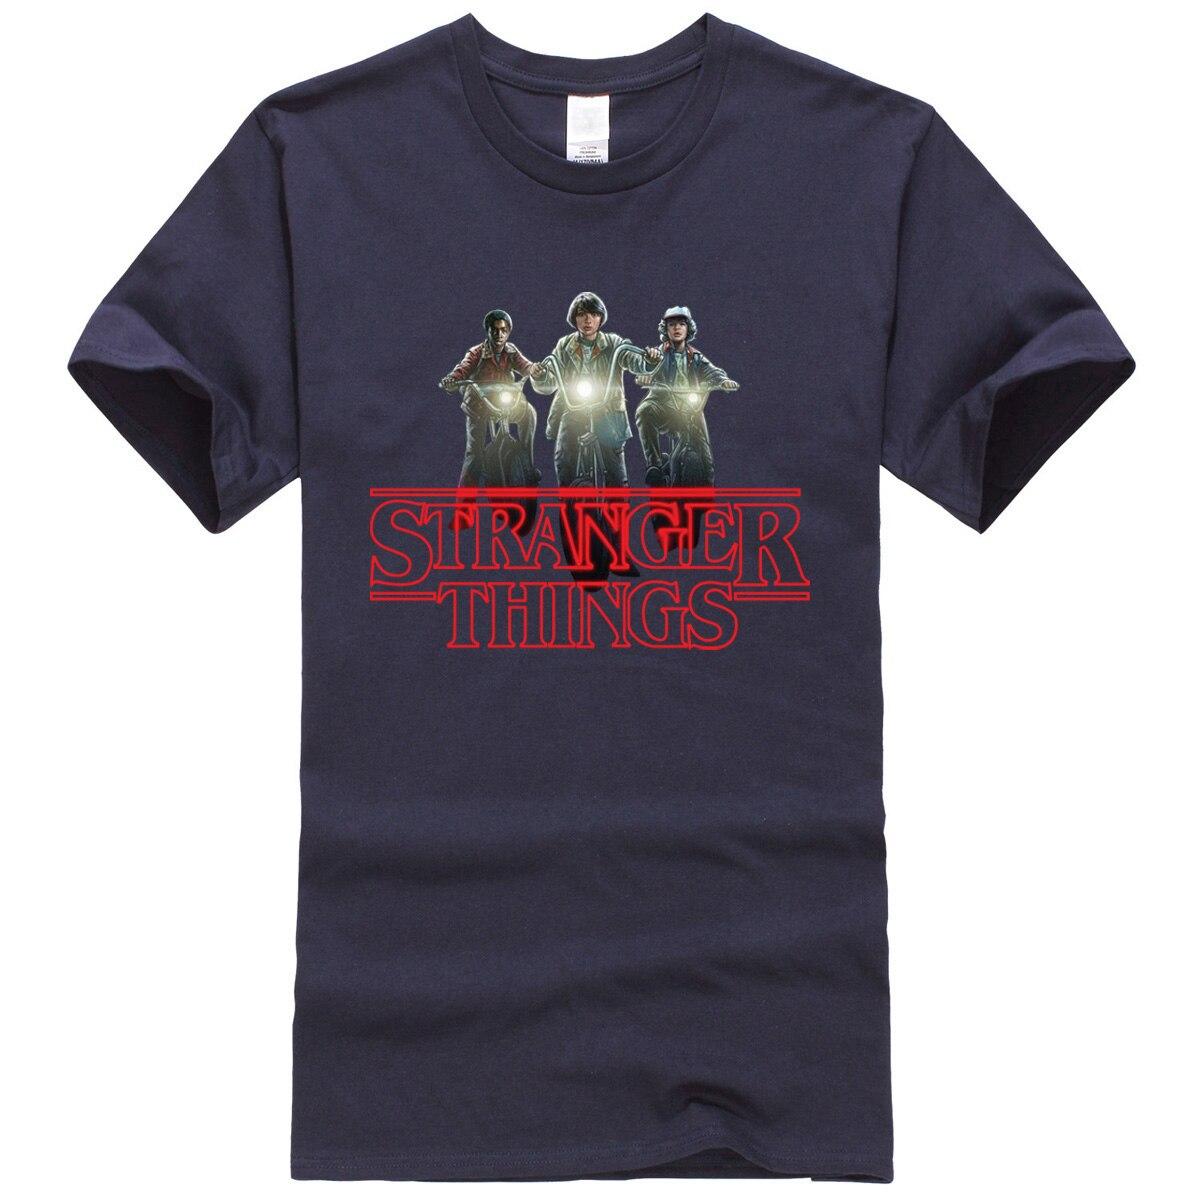 Women plus size fashion cotton T-shirts male quality top Mens tee shirt summer Hip Hop Men short sleeve camisetas clothing S-3XL